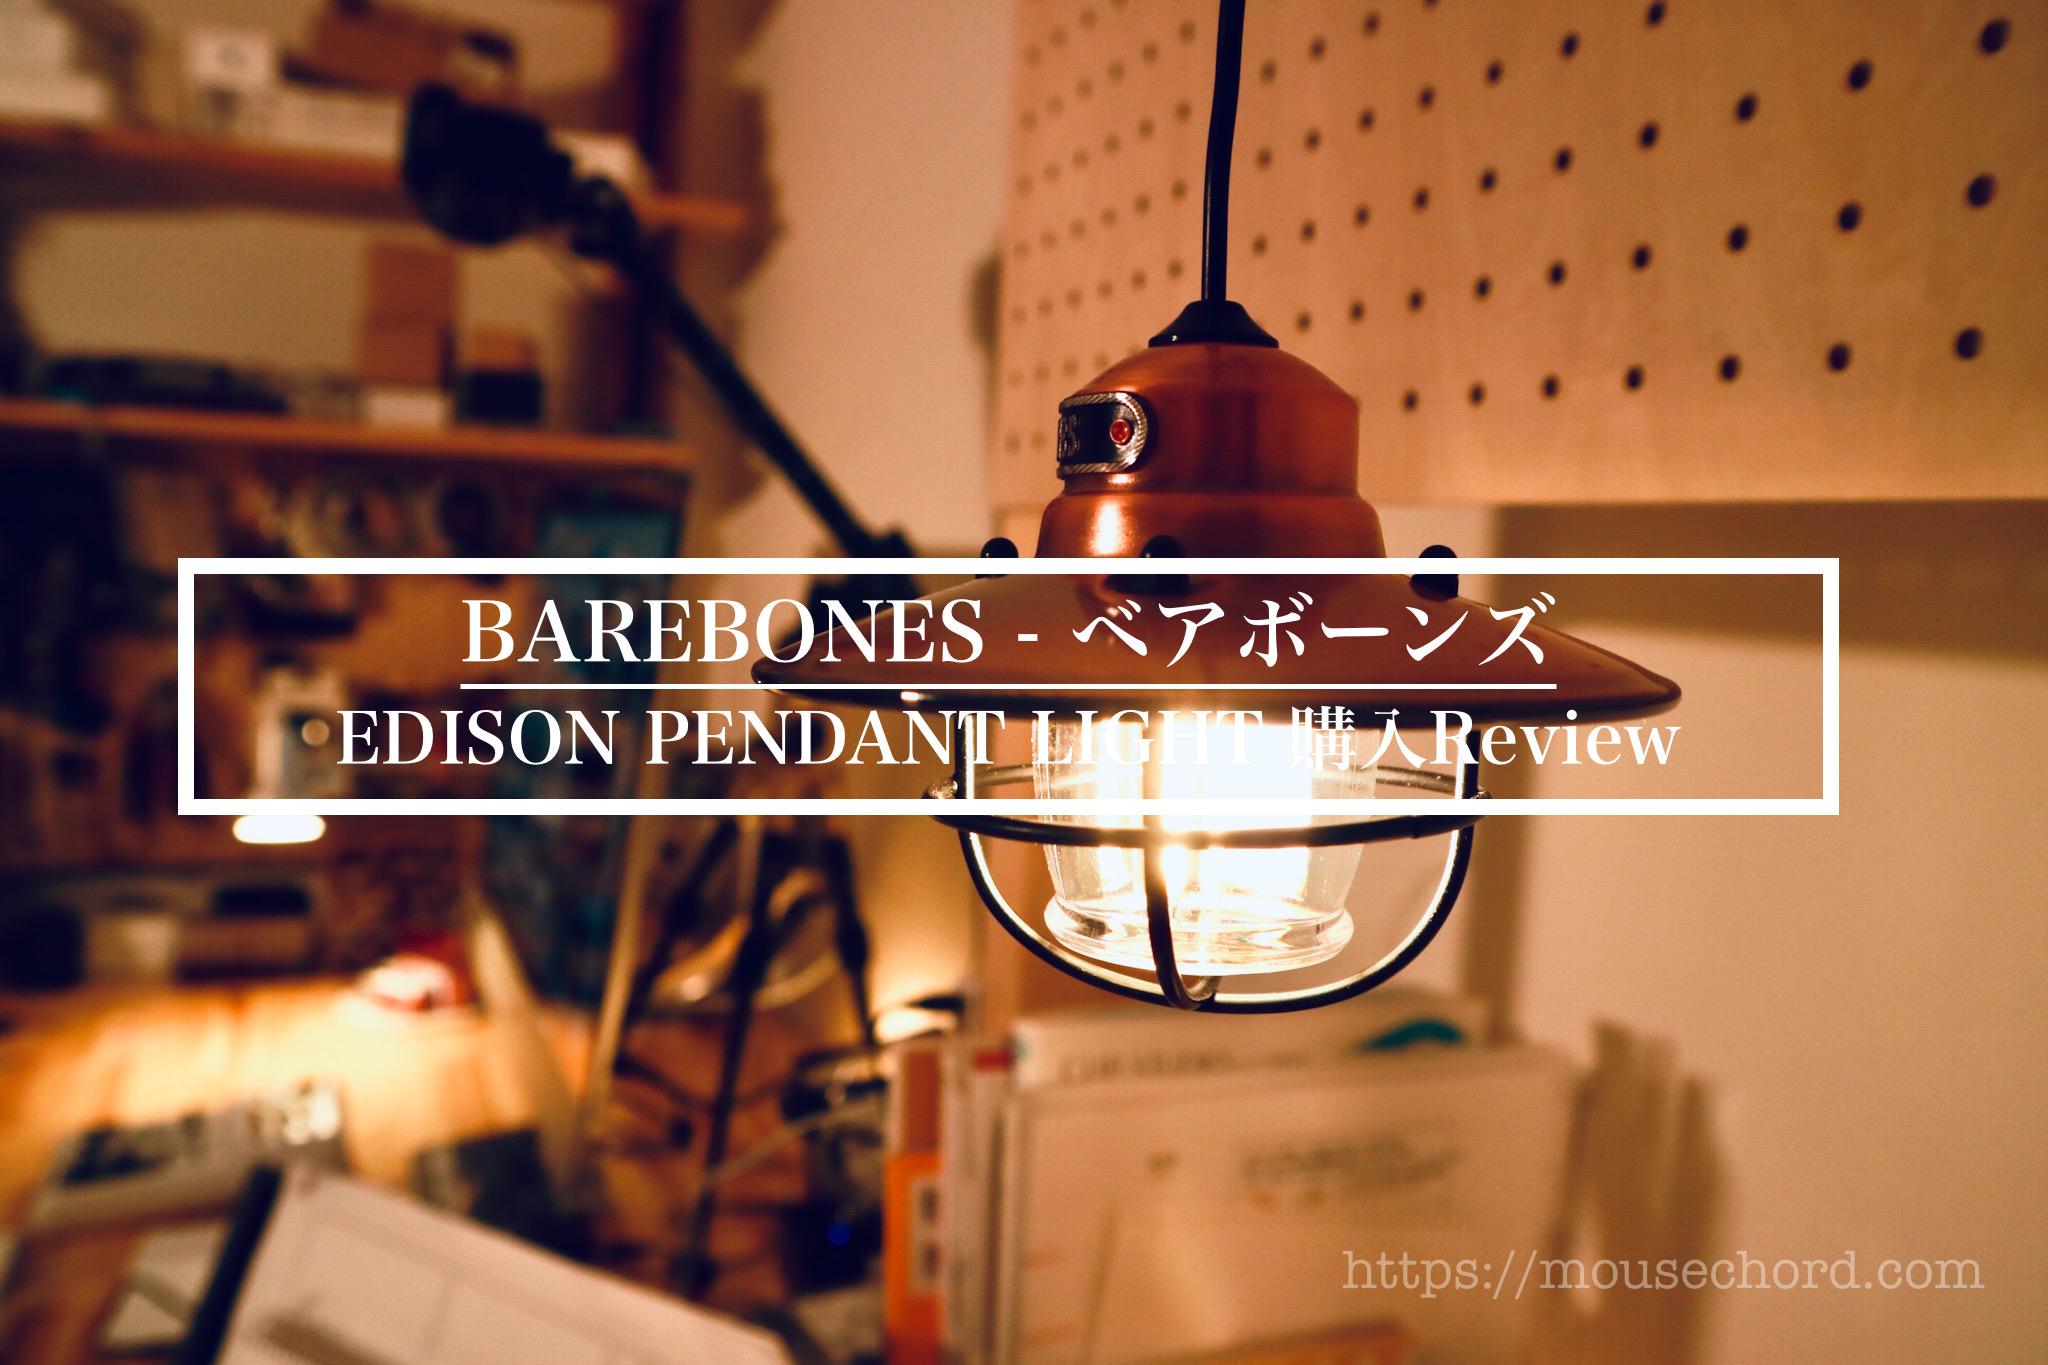 Barebones Edison Pendant Light購入review Mousechord Com